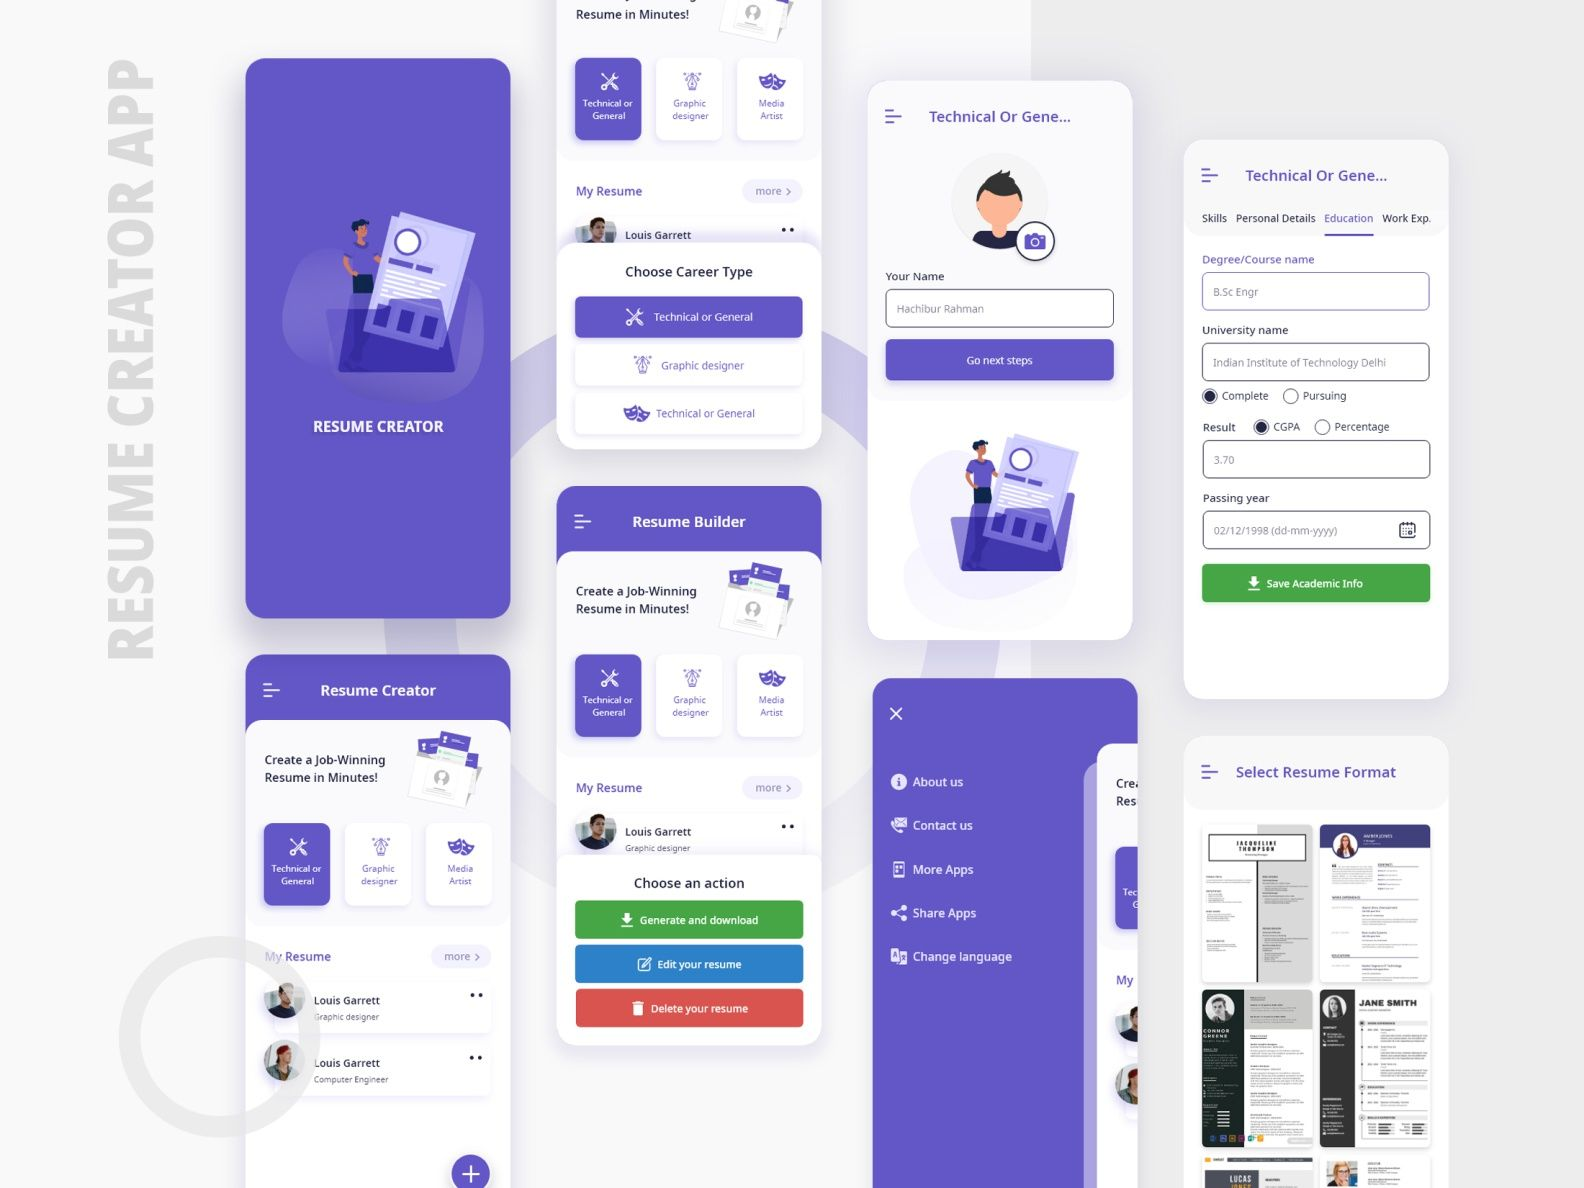 Resume creator app 2 Resume creator, App, Resume